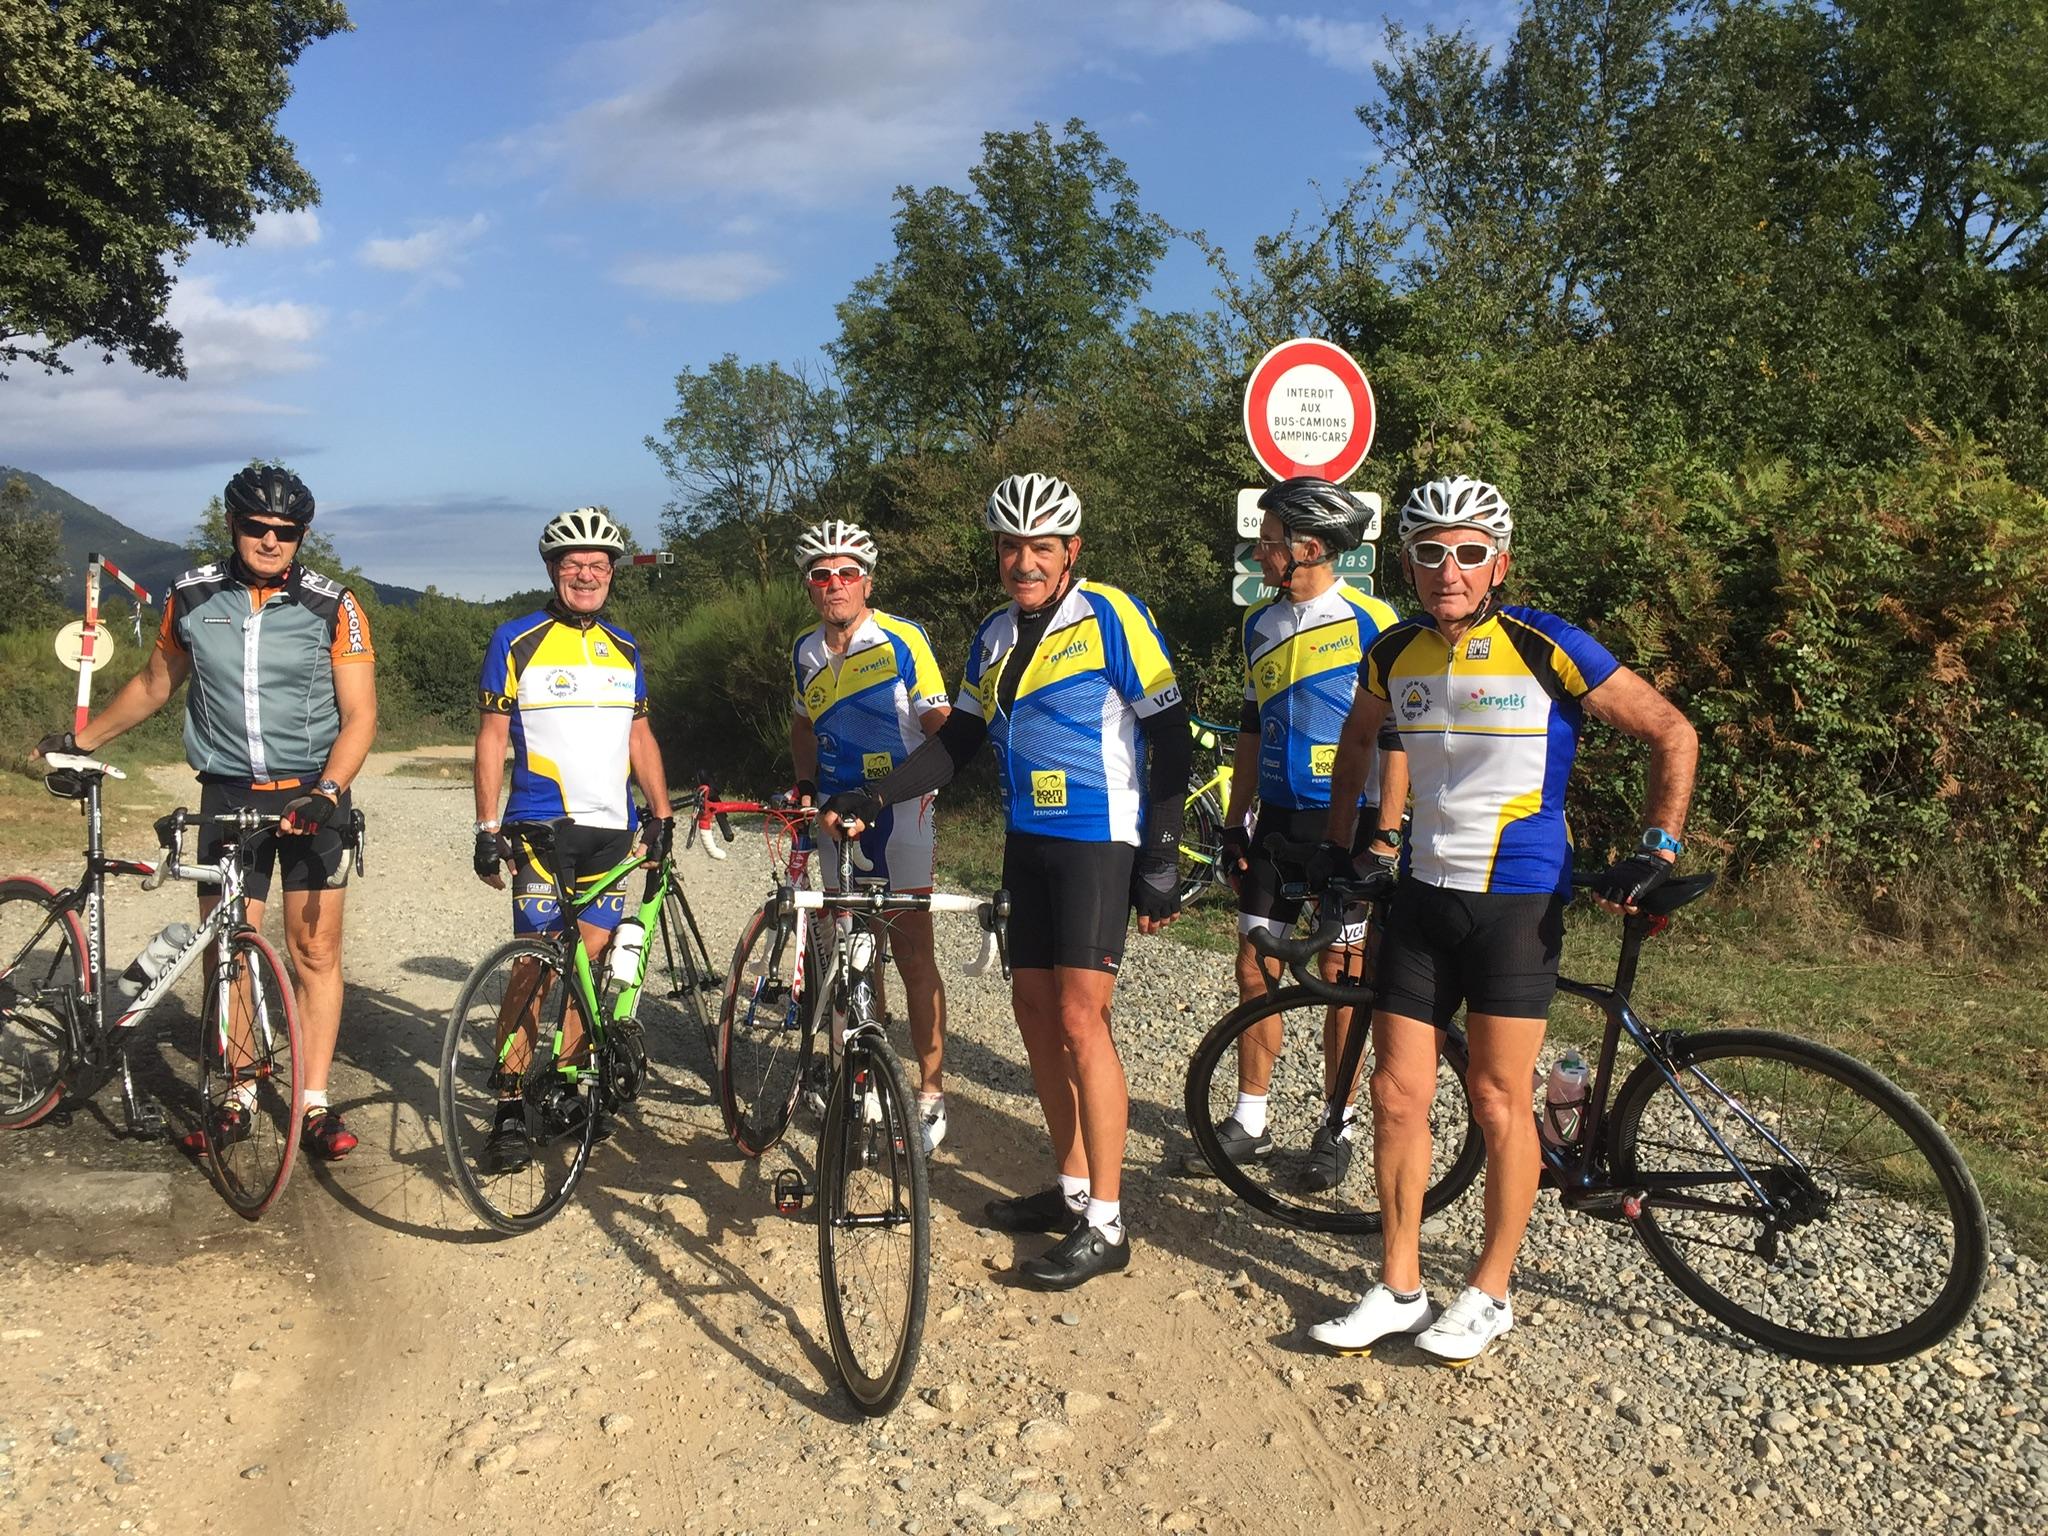 Vélo ROUTE groupes I, Il, III et IV